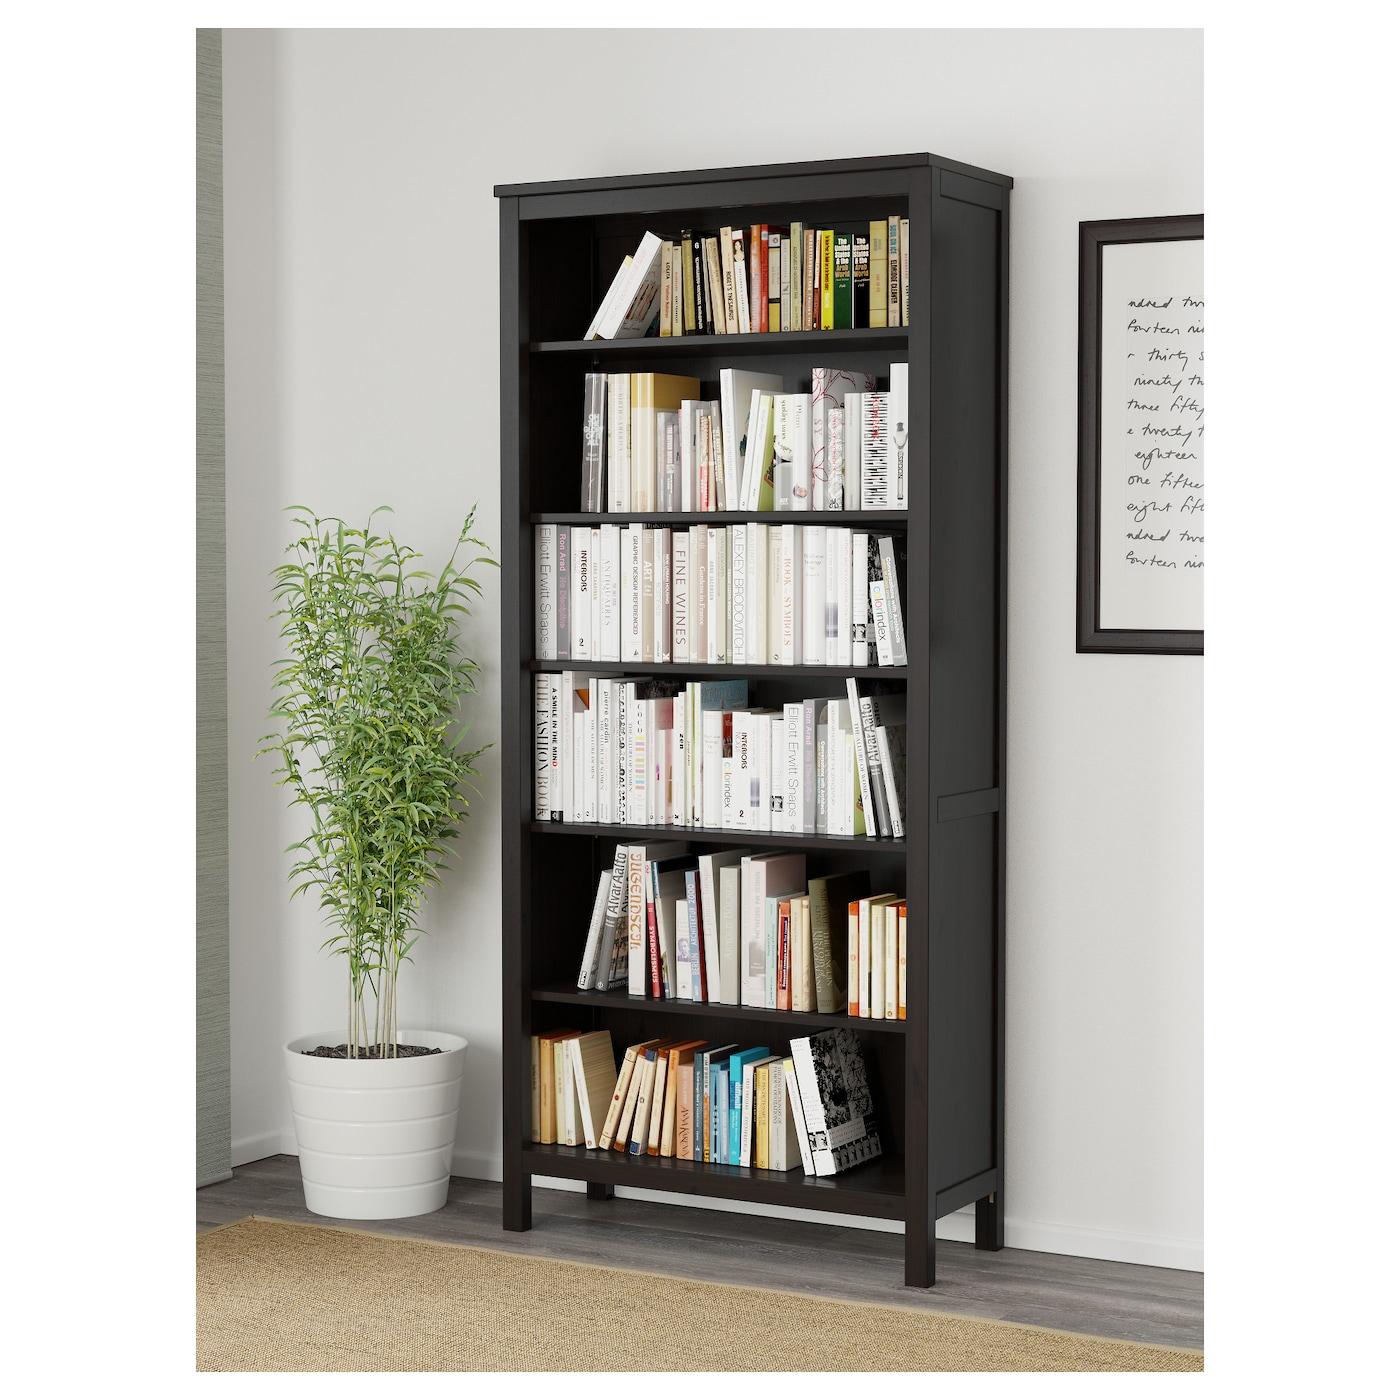 hemnes boekenkast zwartbruin 90 x 197 cm ikea. Black Bedroom Furniture Sets. Home Design Ideas